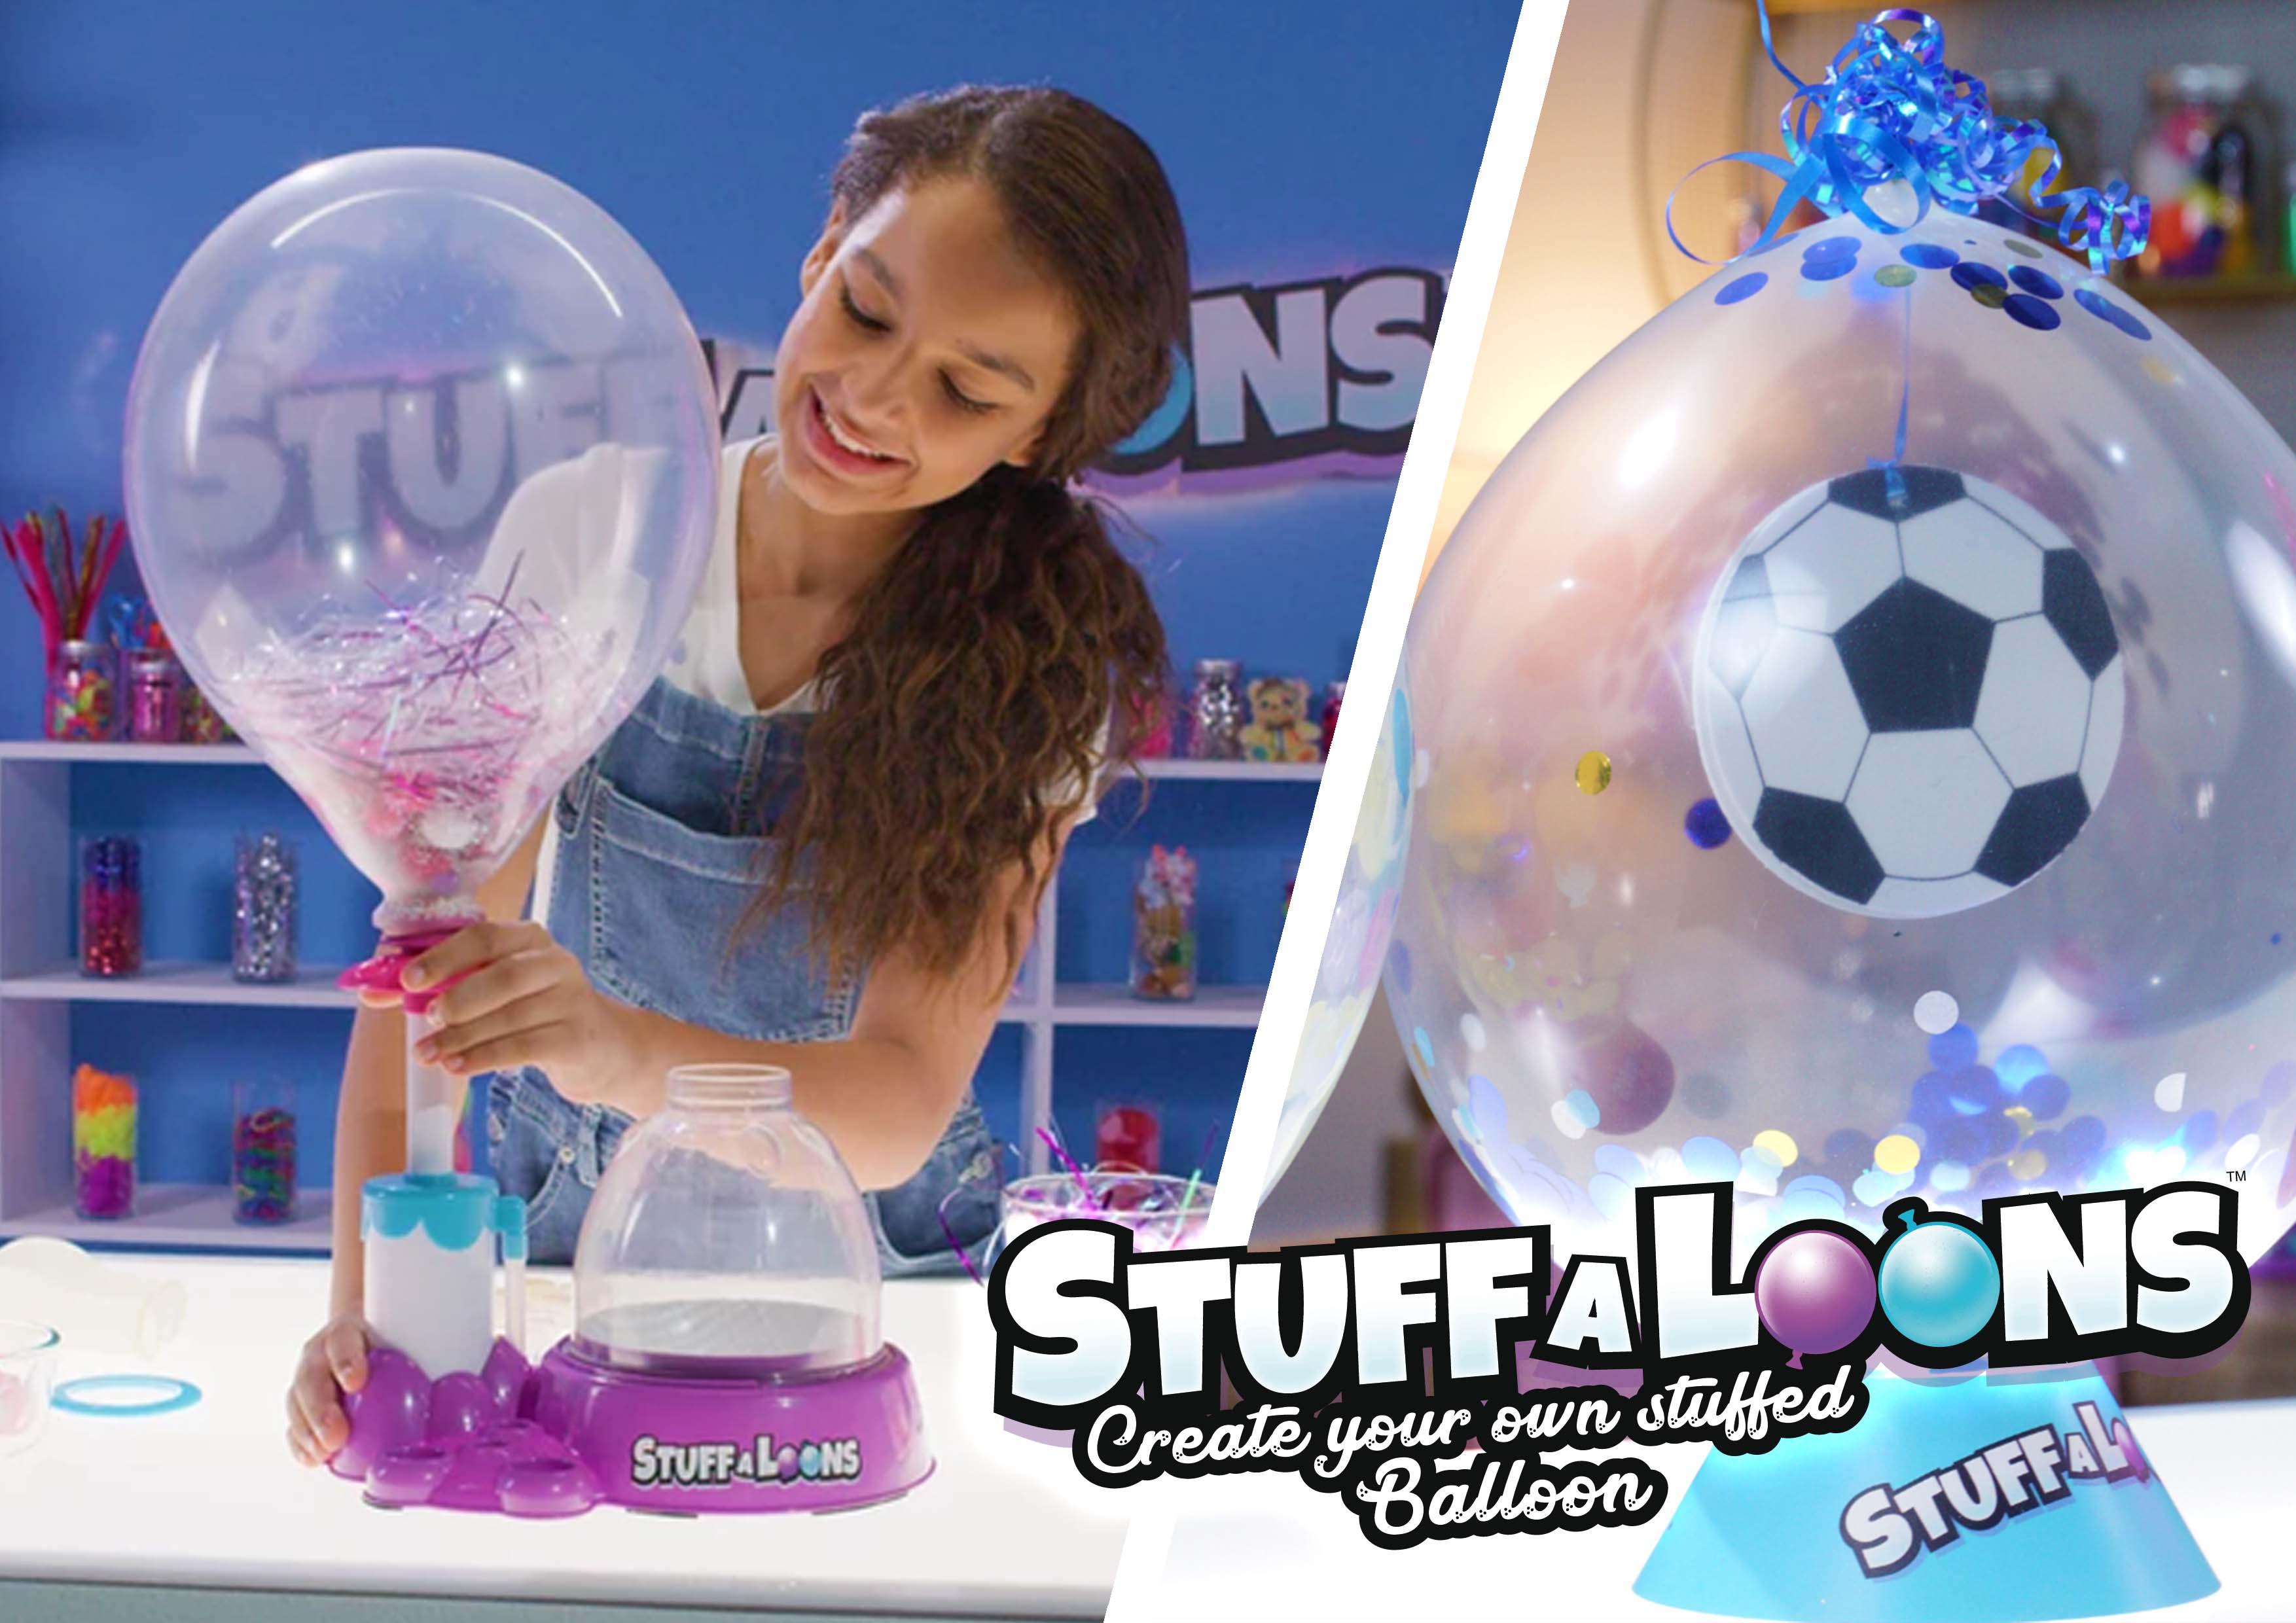 Stuffaloons